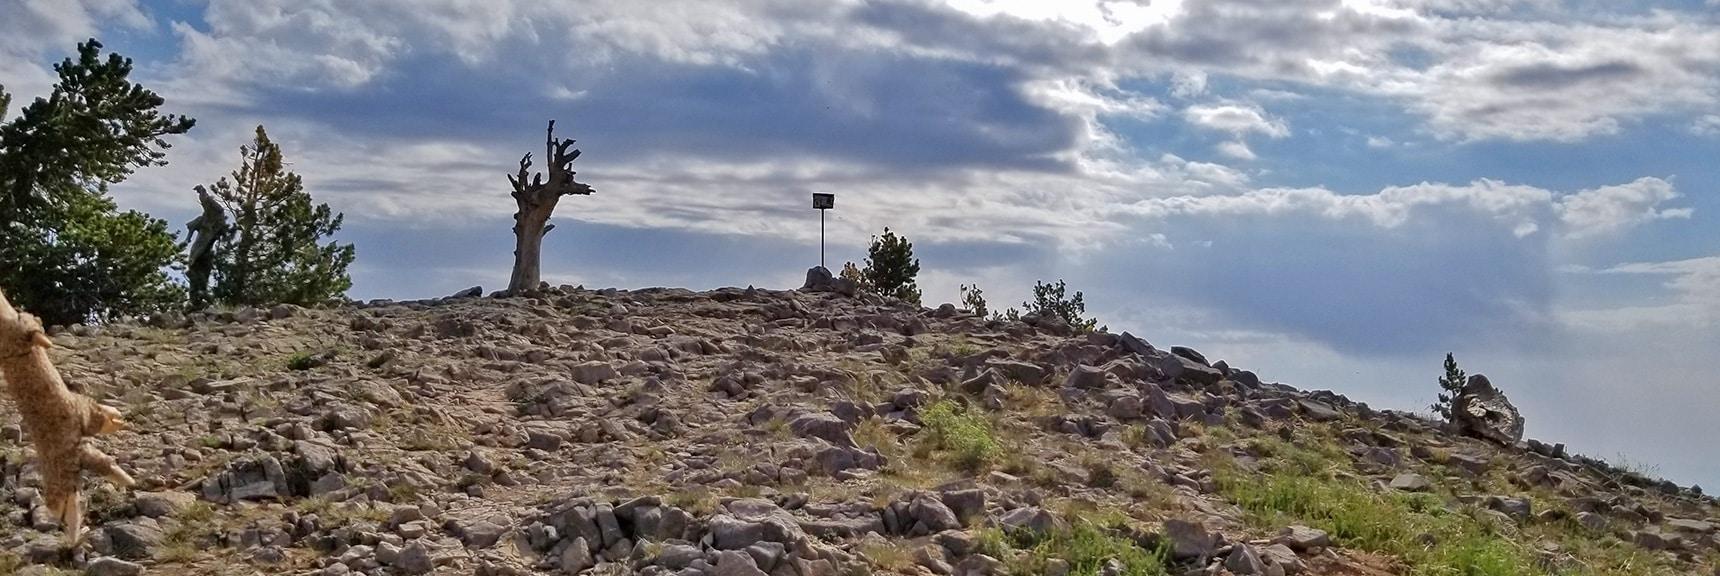 Arrival at Griffith Peak Summit - Summit Box on Pole | Sexton Ridge Descent from Griffith Peak, Mt. Charleston Wilderness, Spring Mountains, Nevada